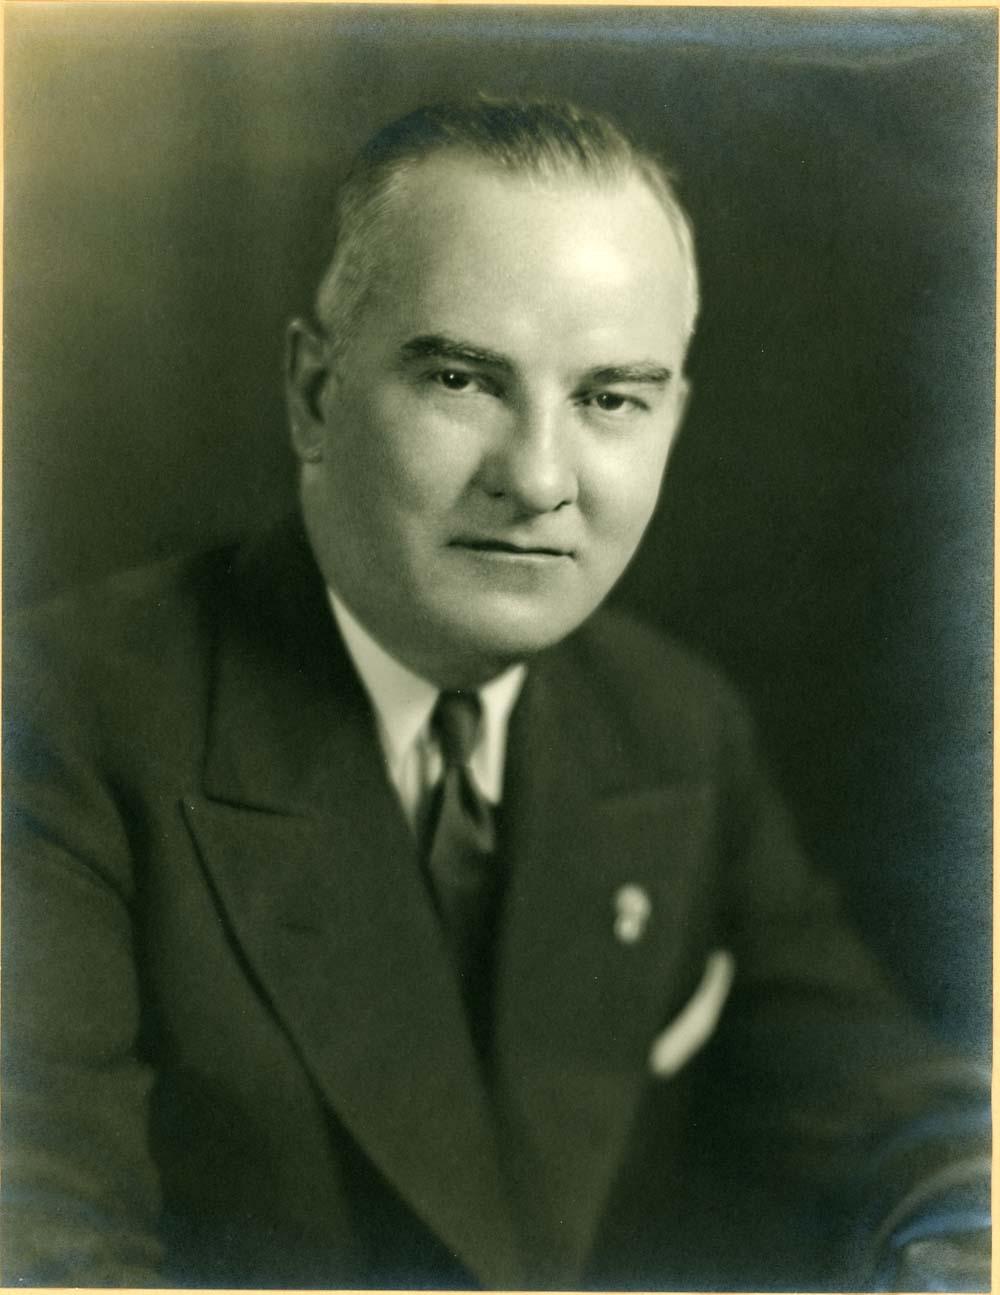 Harry Walter Colmery